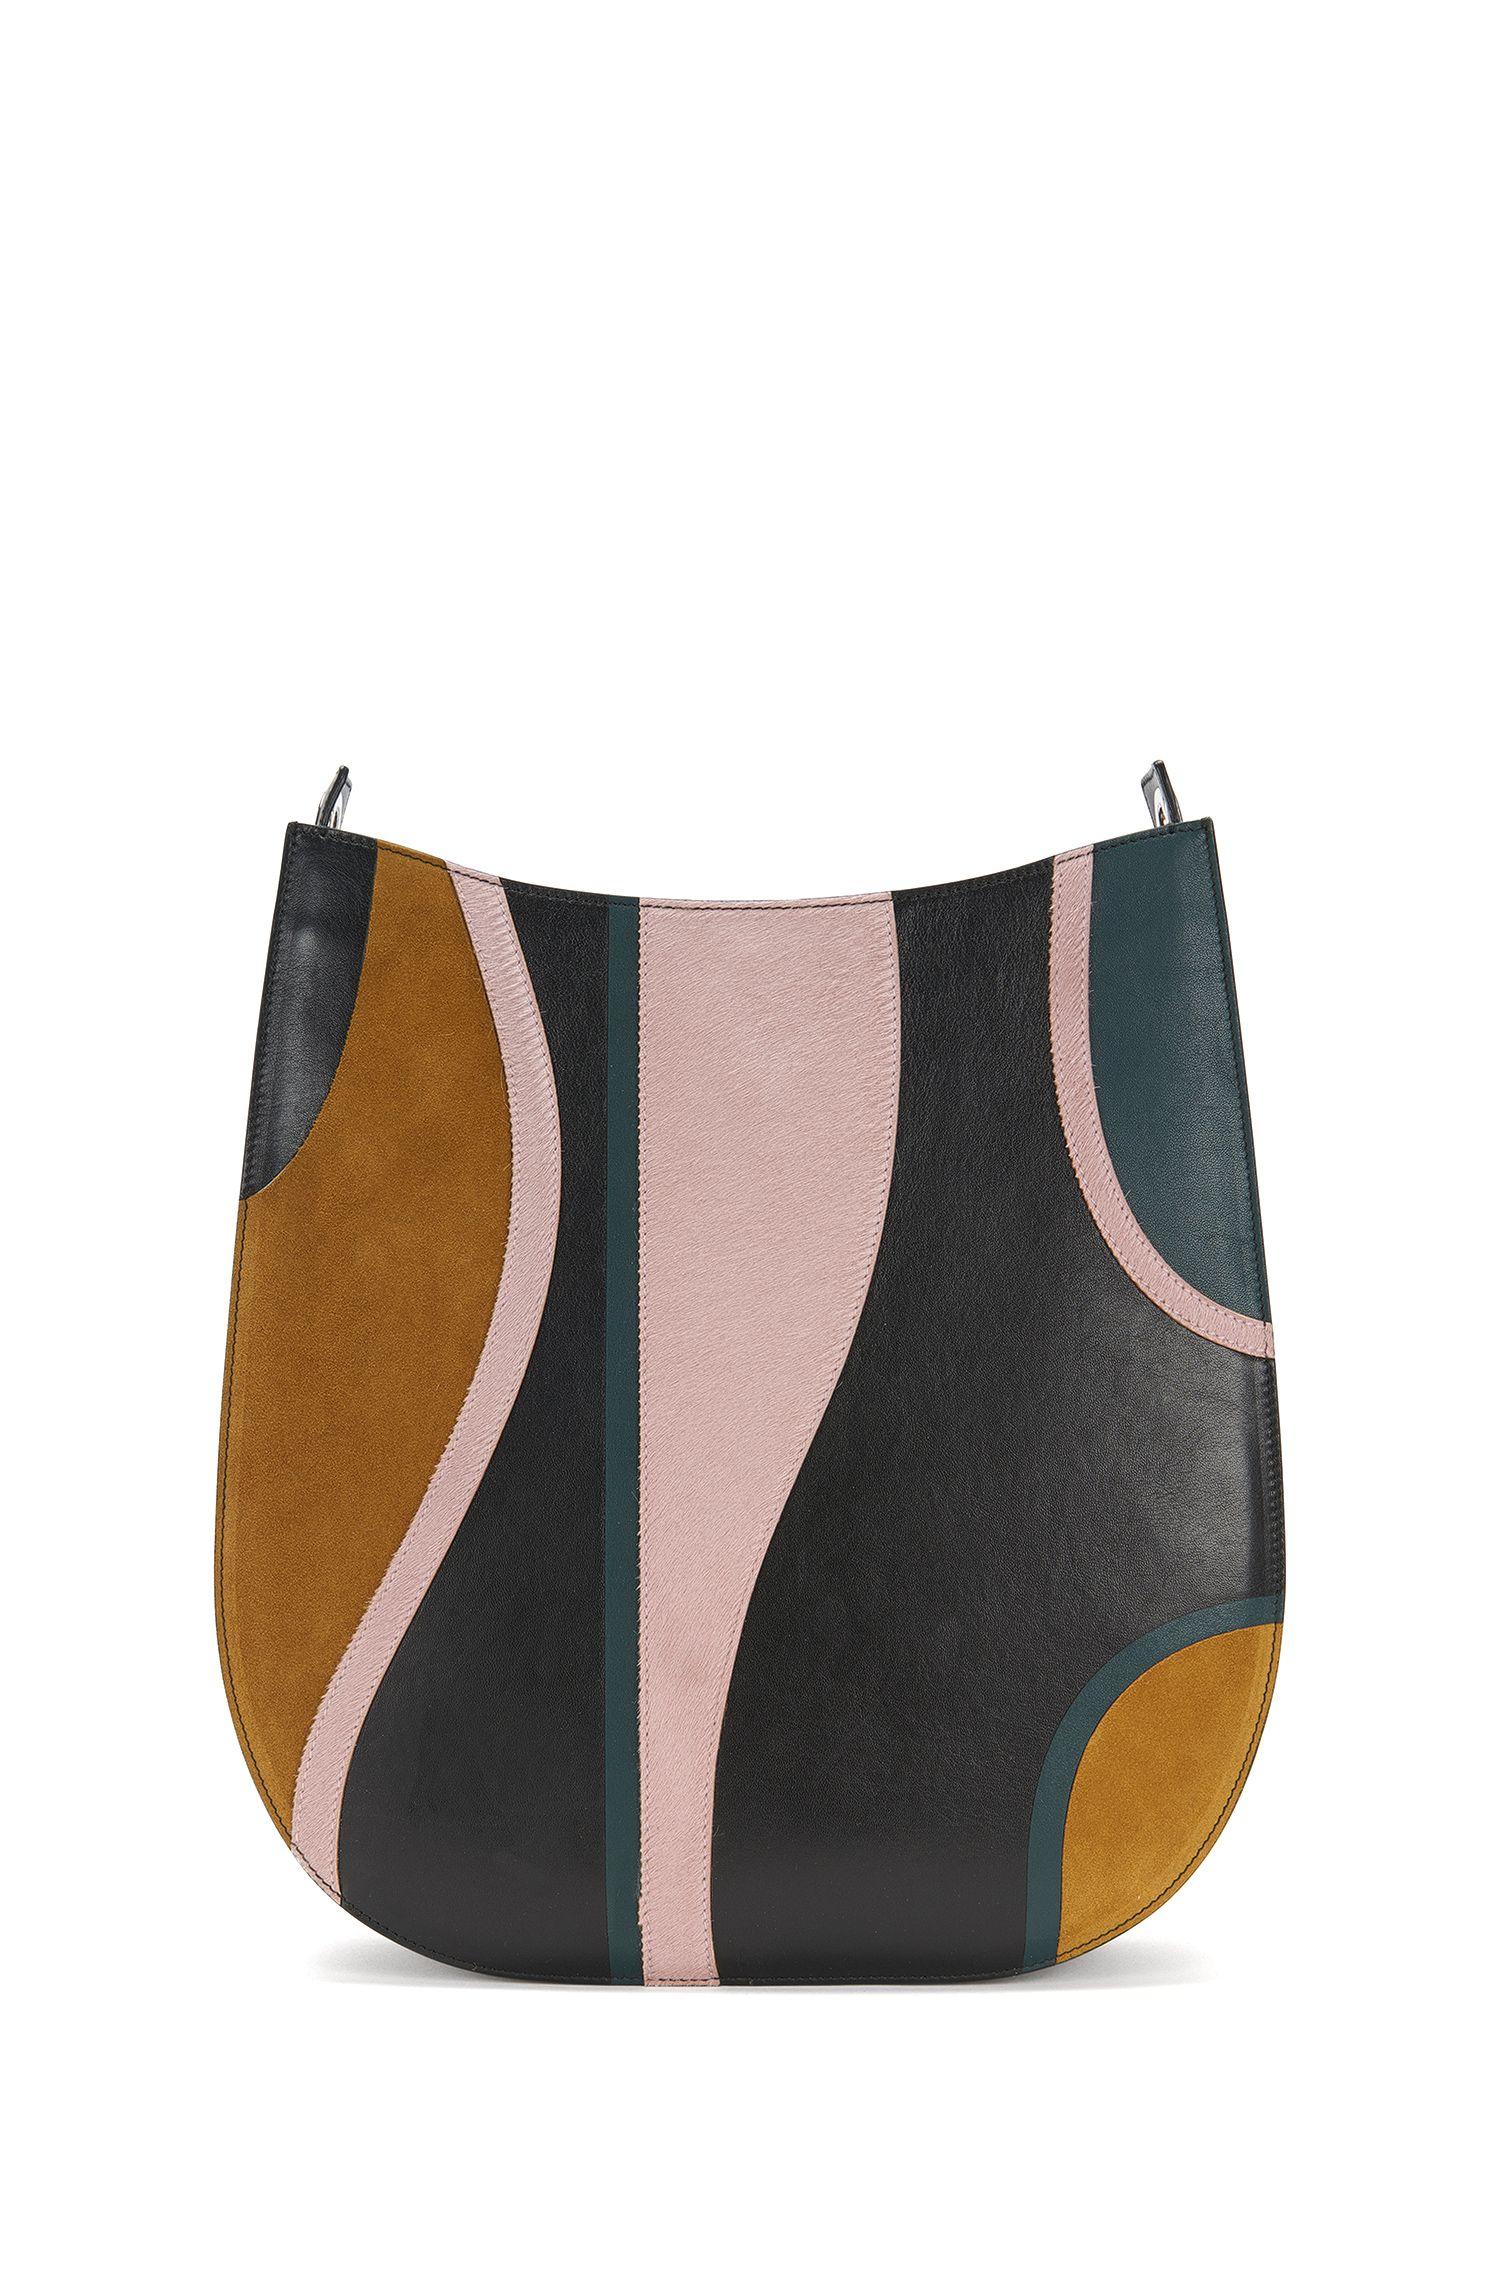 'BOSS Bespoke H S-G' | Italian Leather Patchwork Hobo Bag, Detachable Chain Strap